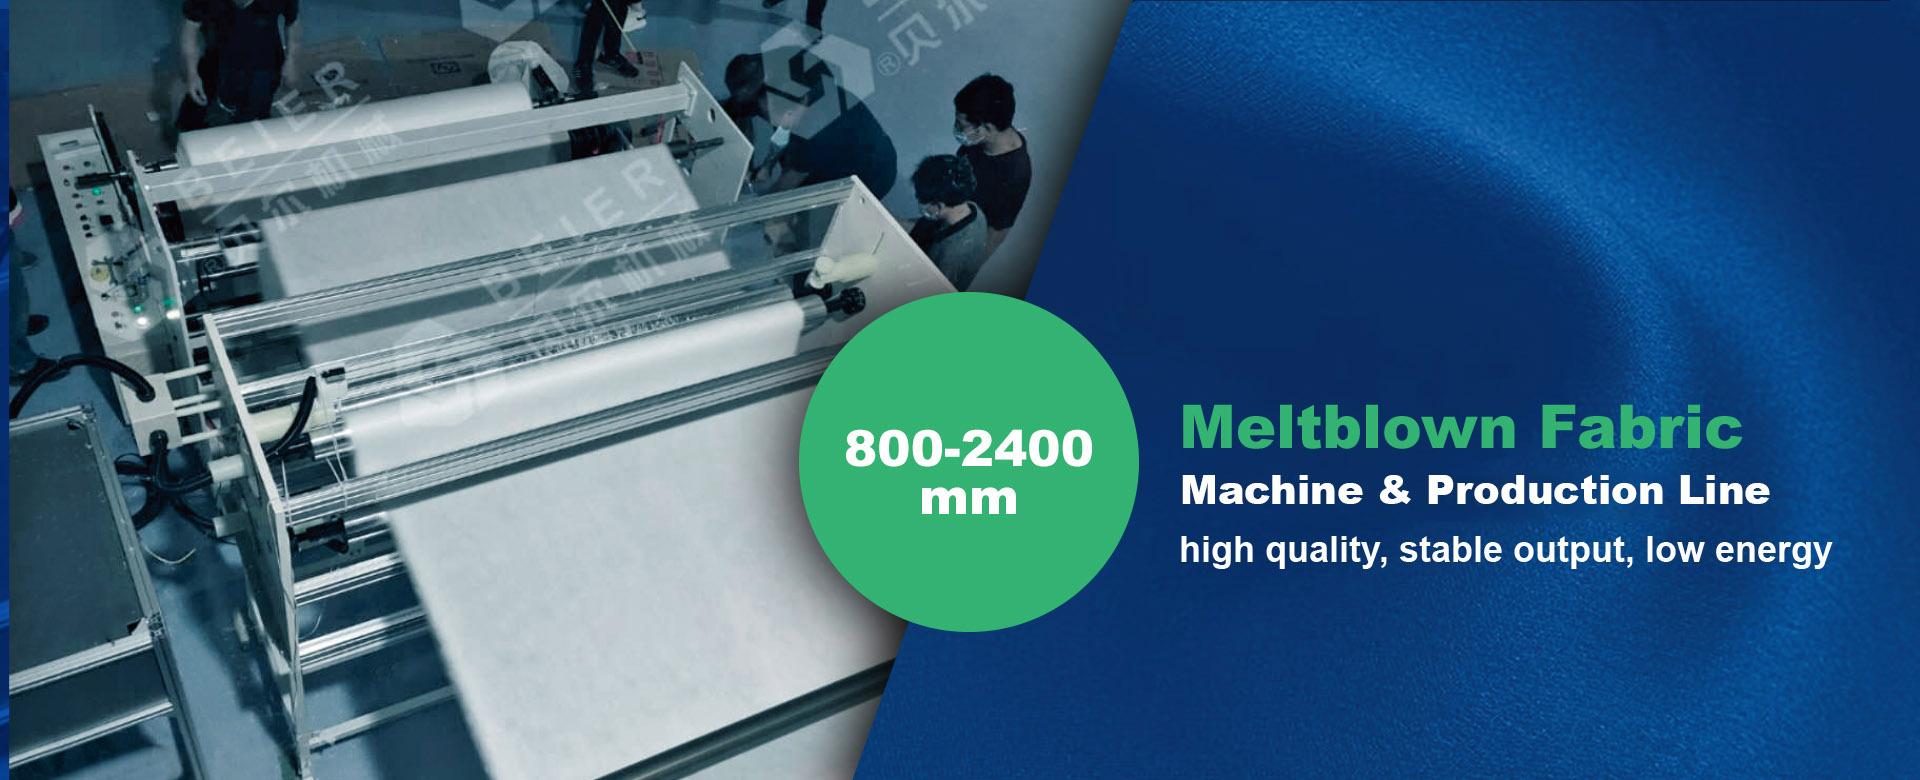 Beier meltblown fabric productin line